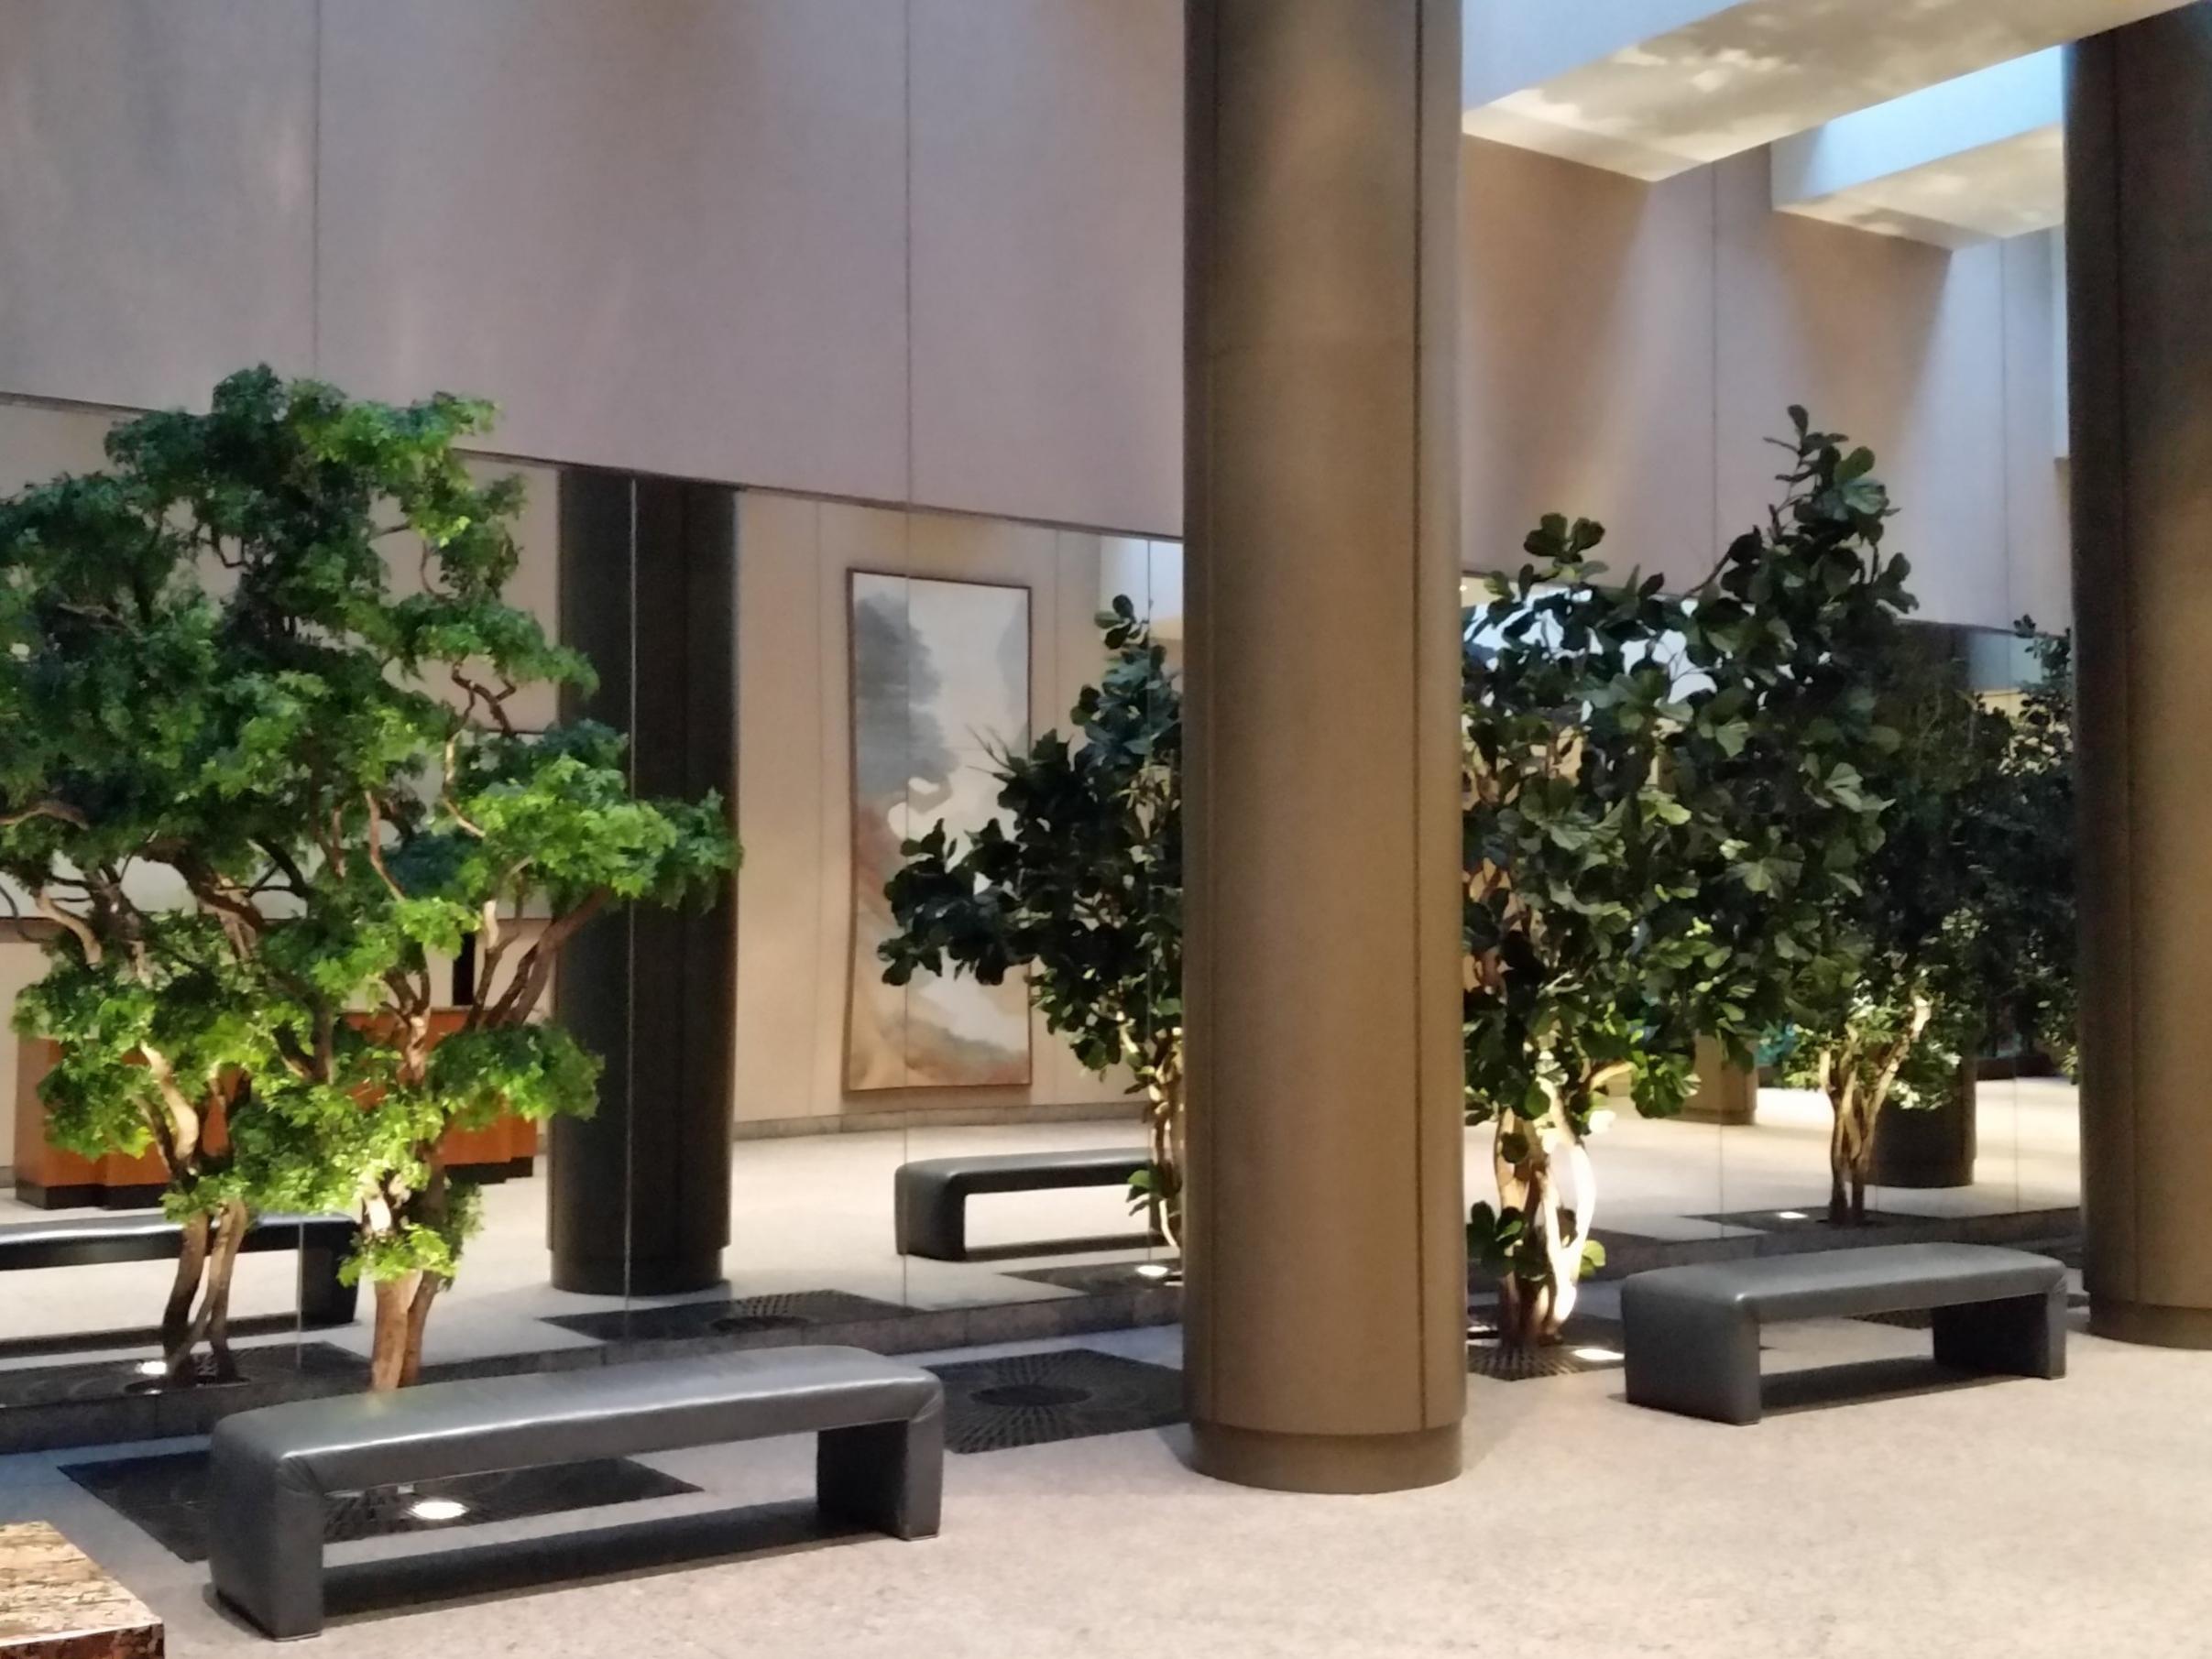 Colonnade Atrium lobby 57th st. NYC